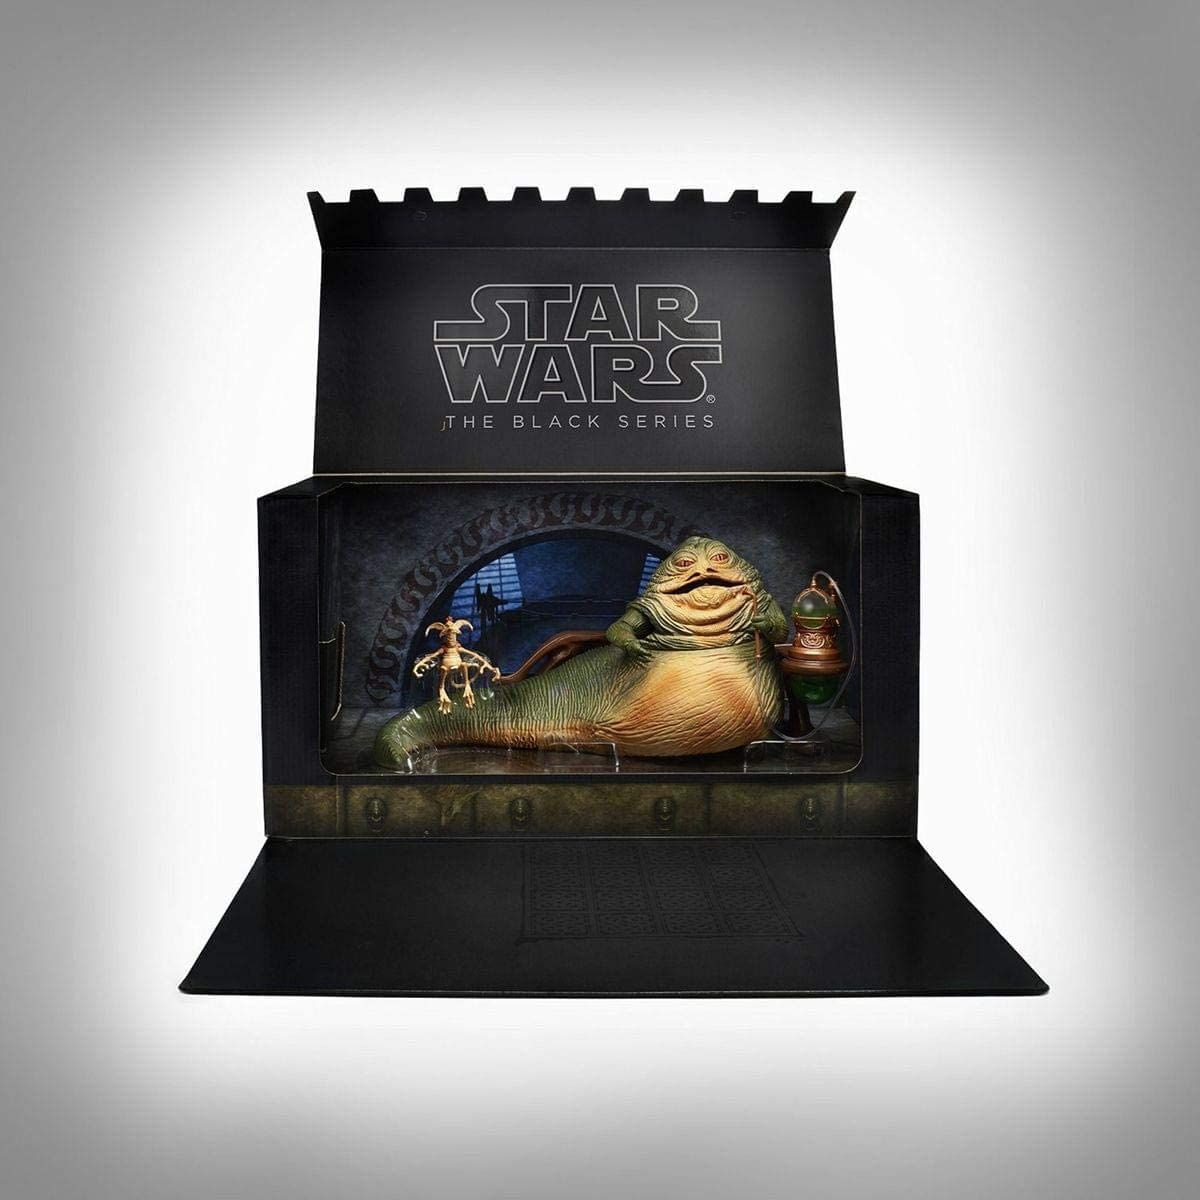 Star Wars Jabba the Hutt & Salacious Crumb Figure 2014 Comic Con SDCC Exclusive